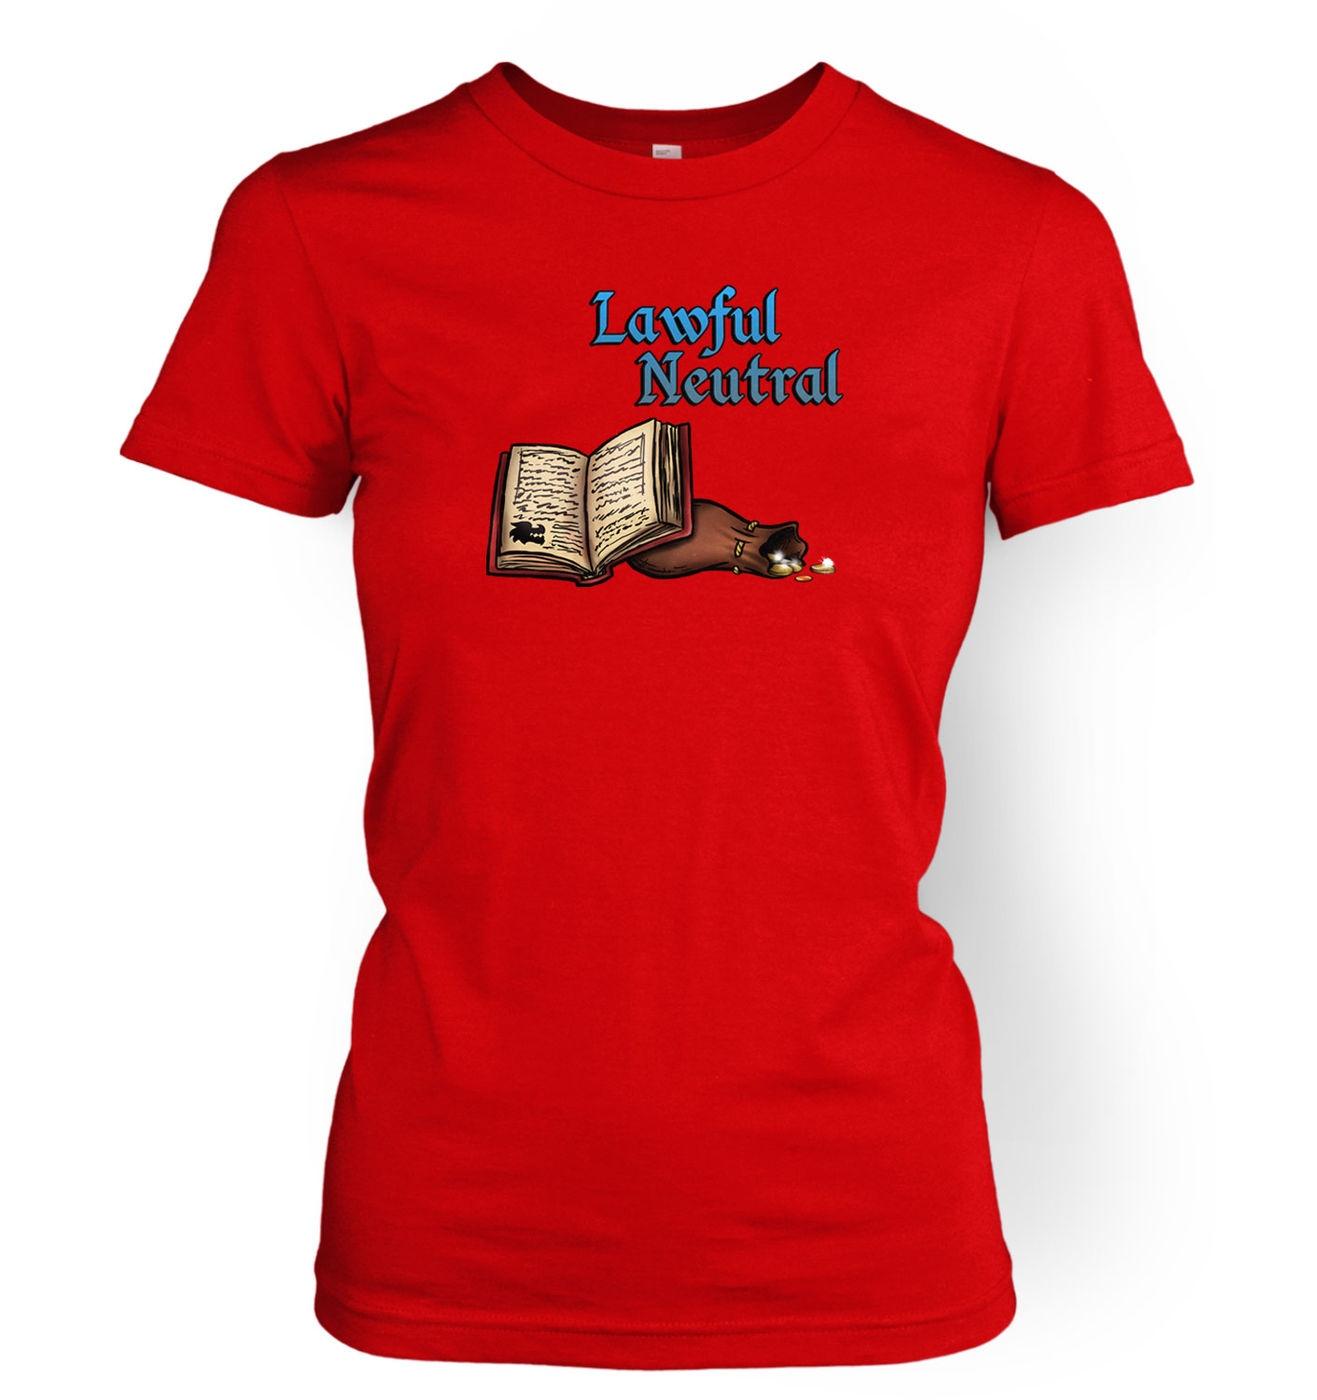 Cartoon Alignment Lawful Neutral womens tee - gaming t-shirts